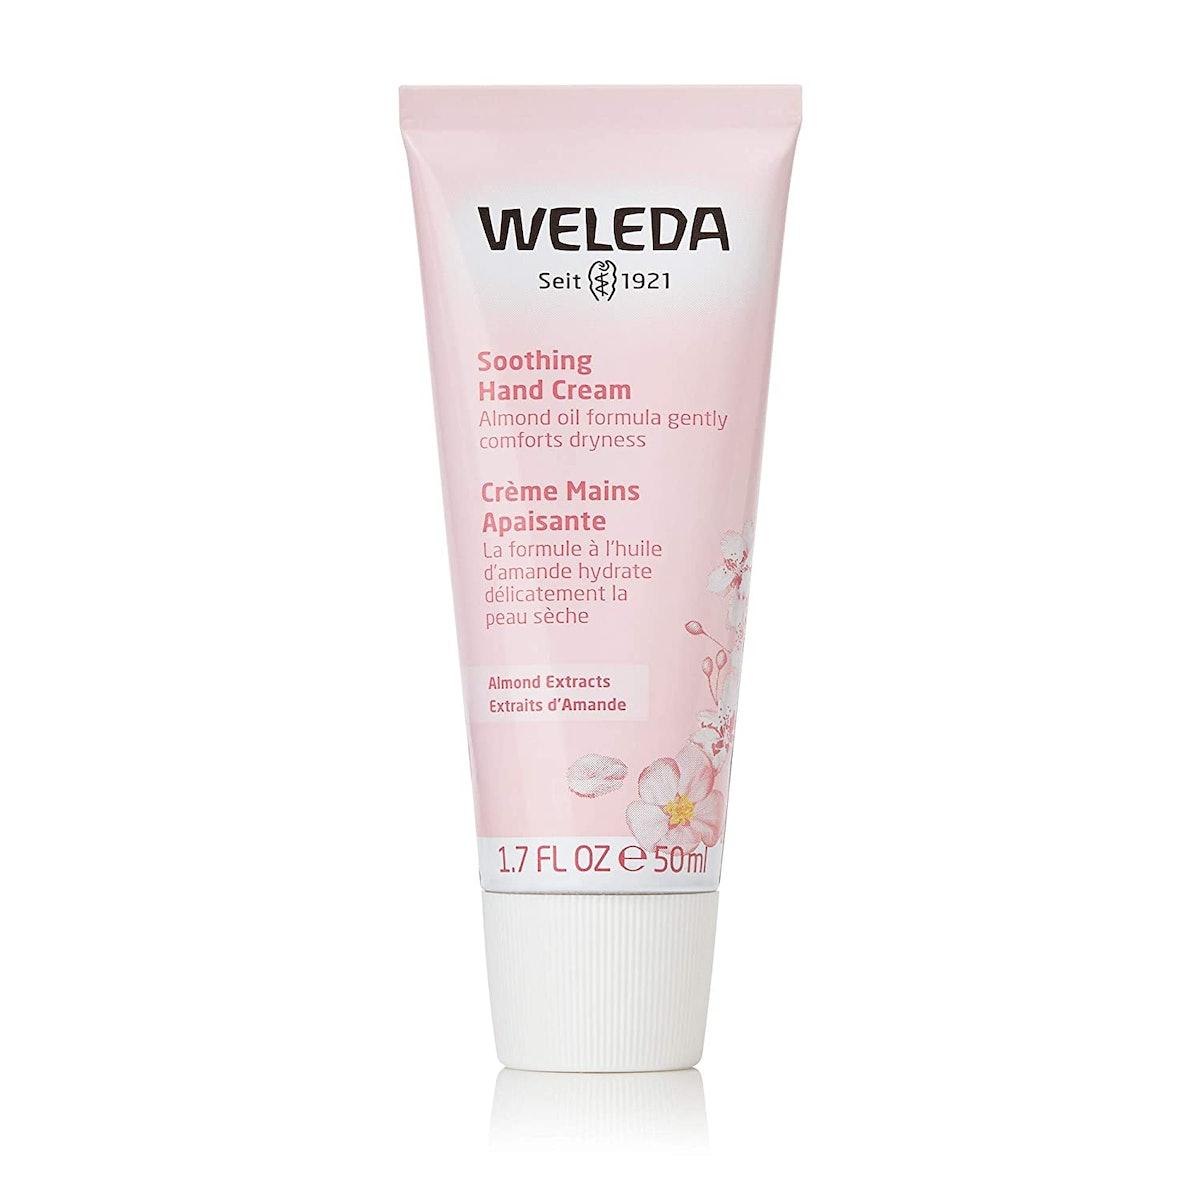 Weleda Soothing Sensitive Skin Almond Hand Cream